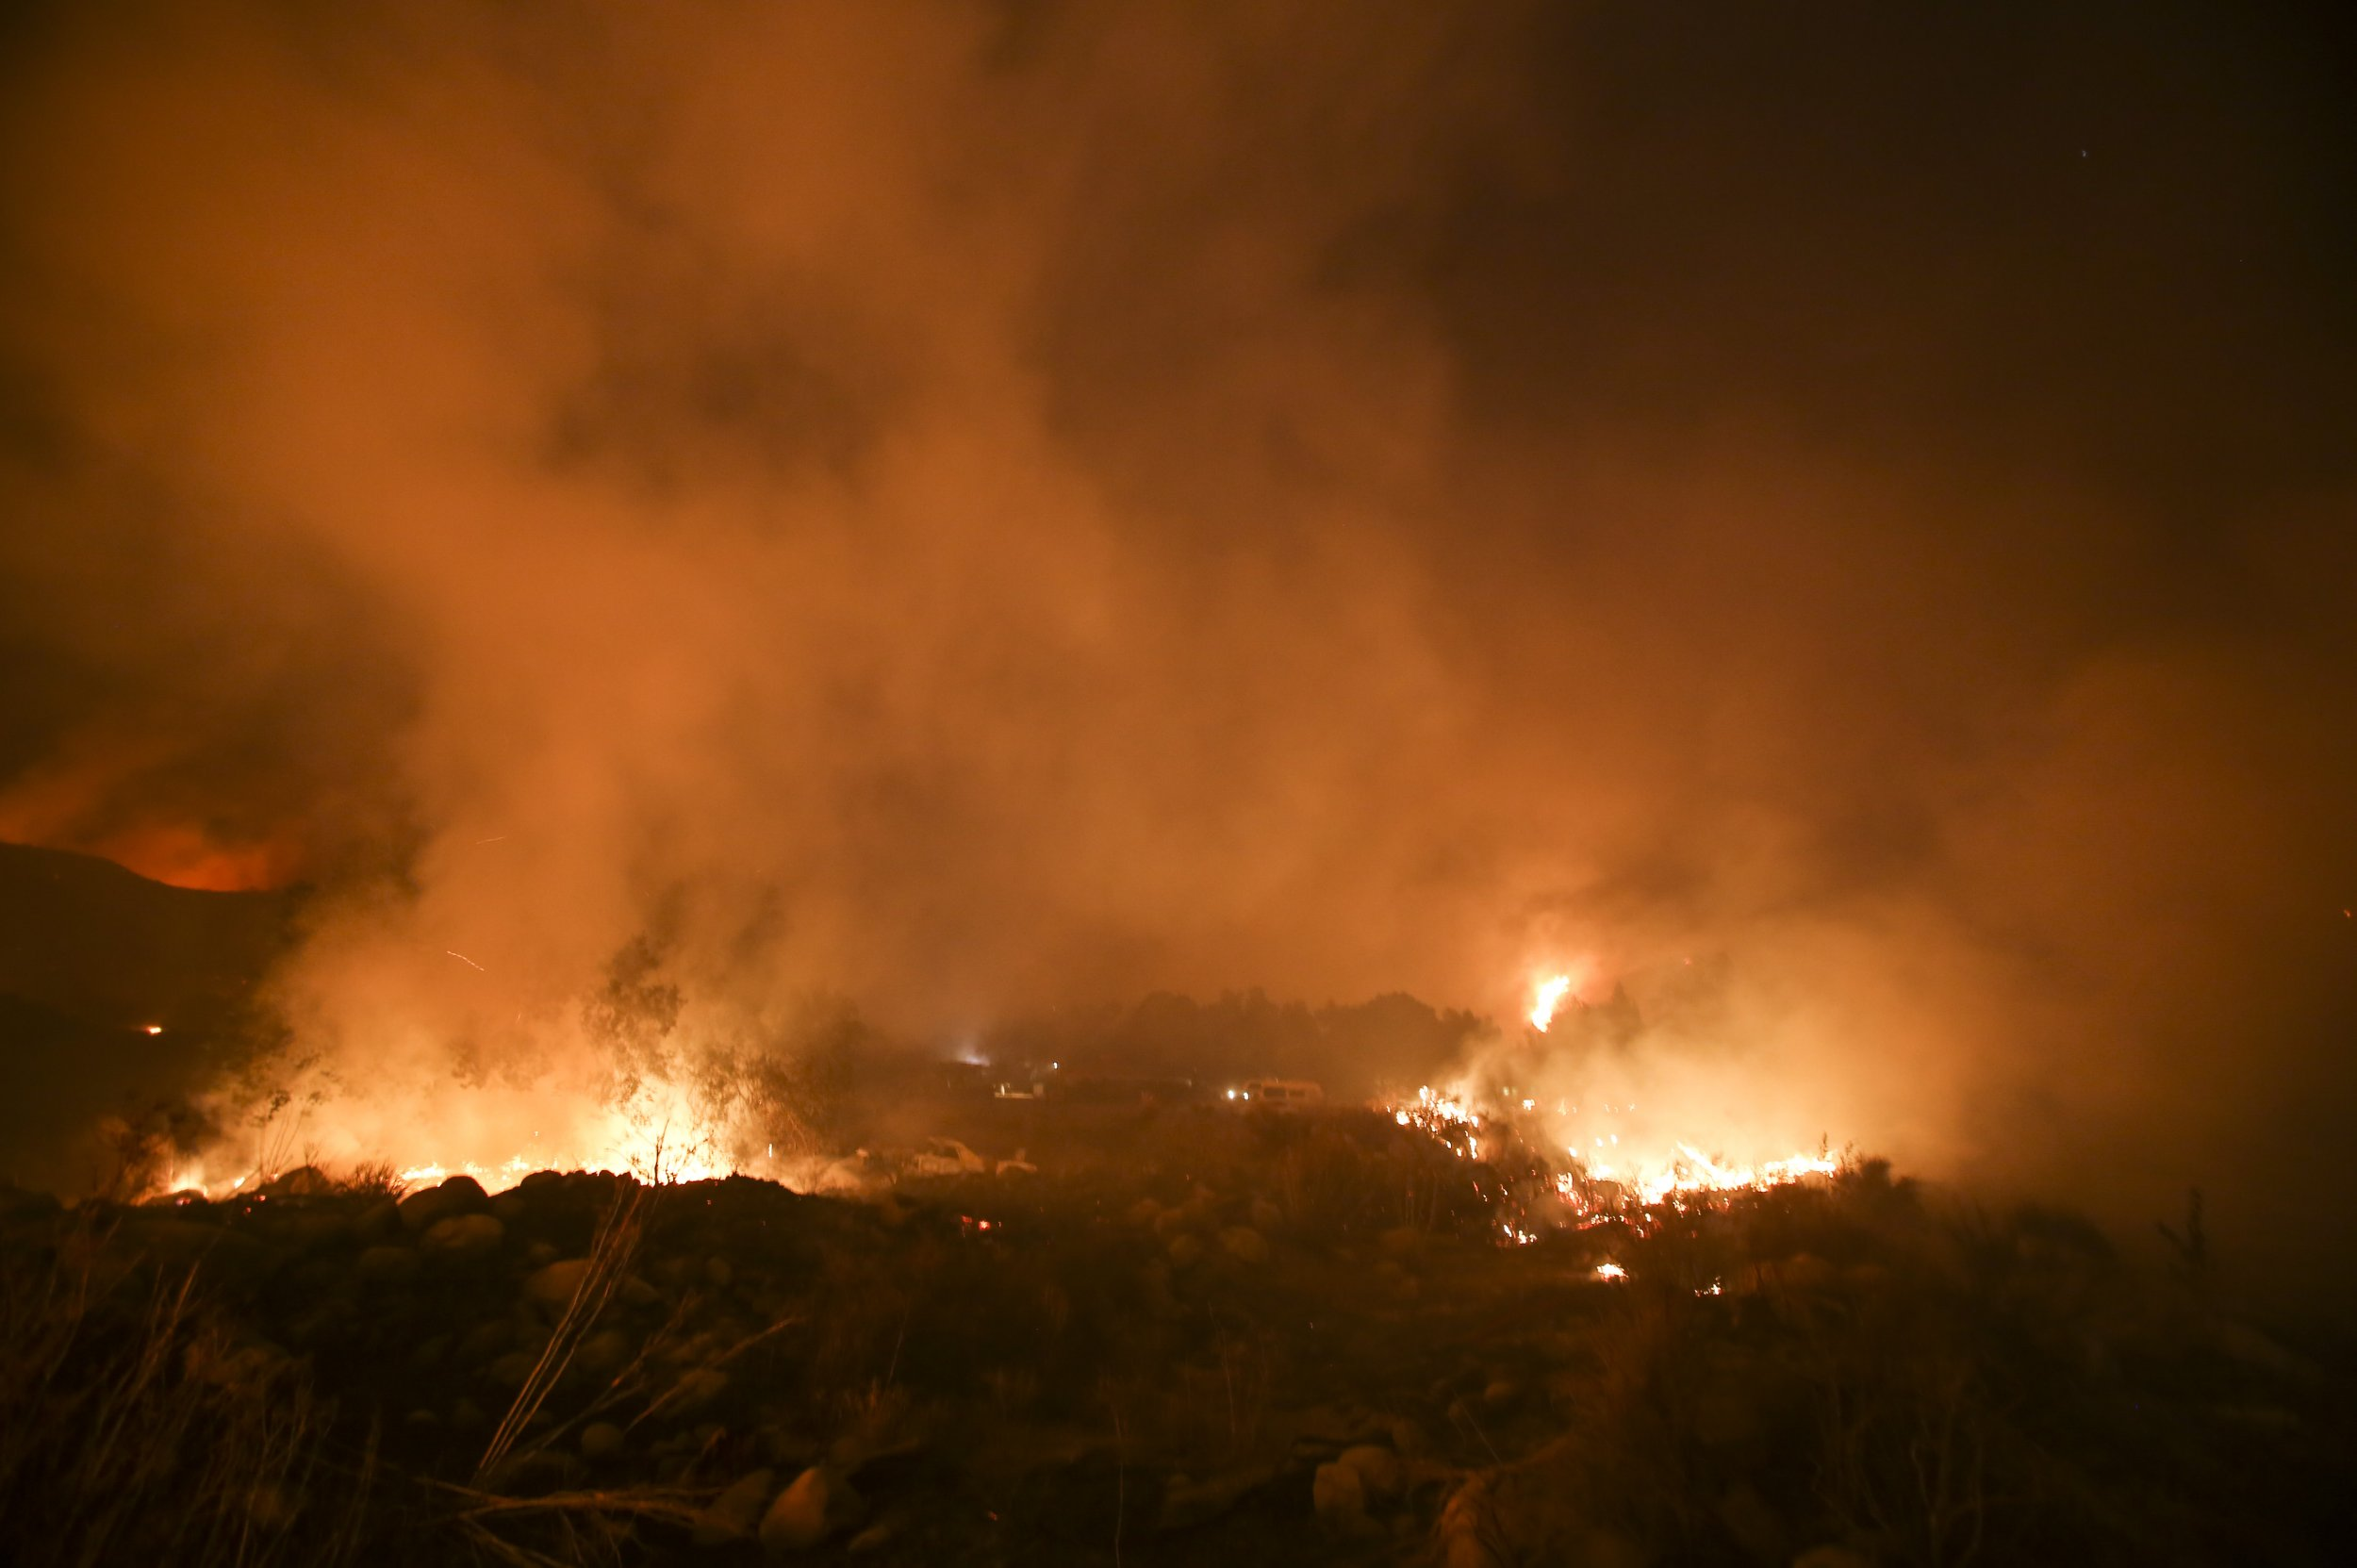 California wildfire hero who saved rabbit goes viral